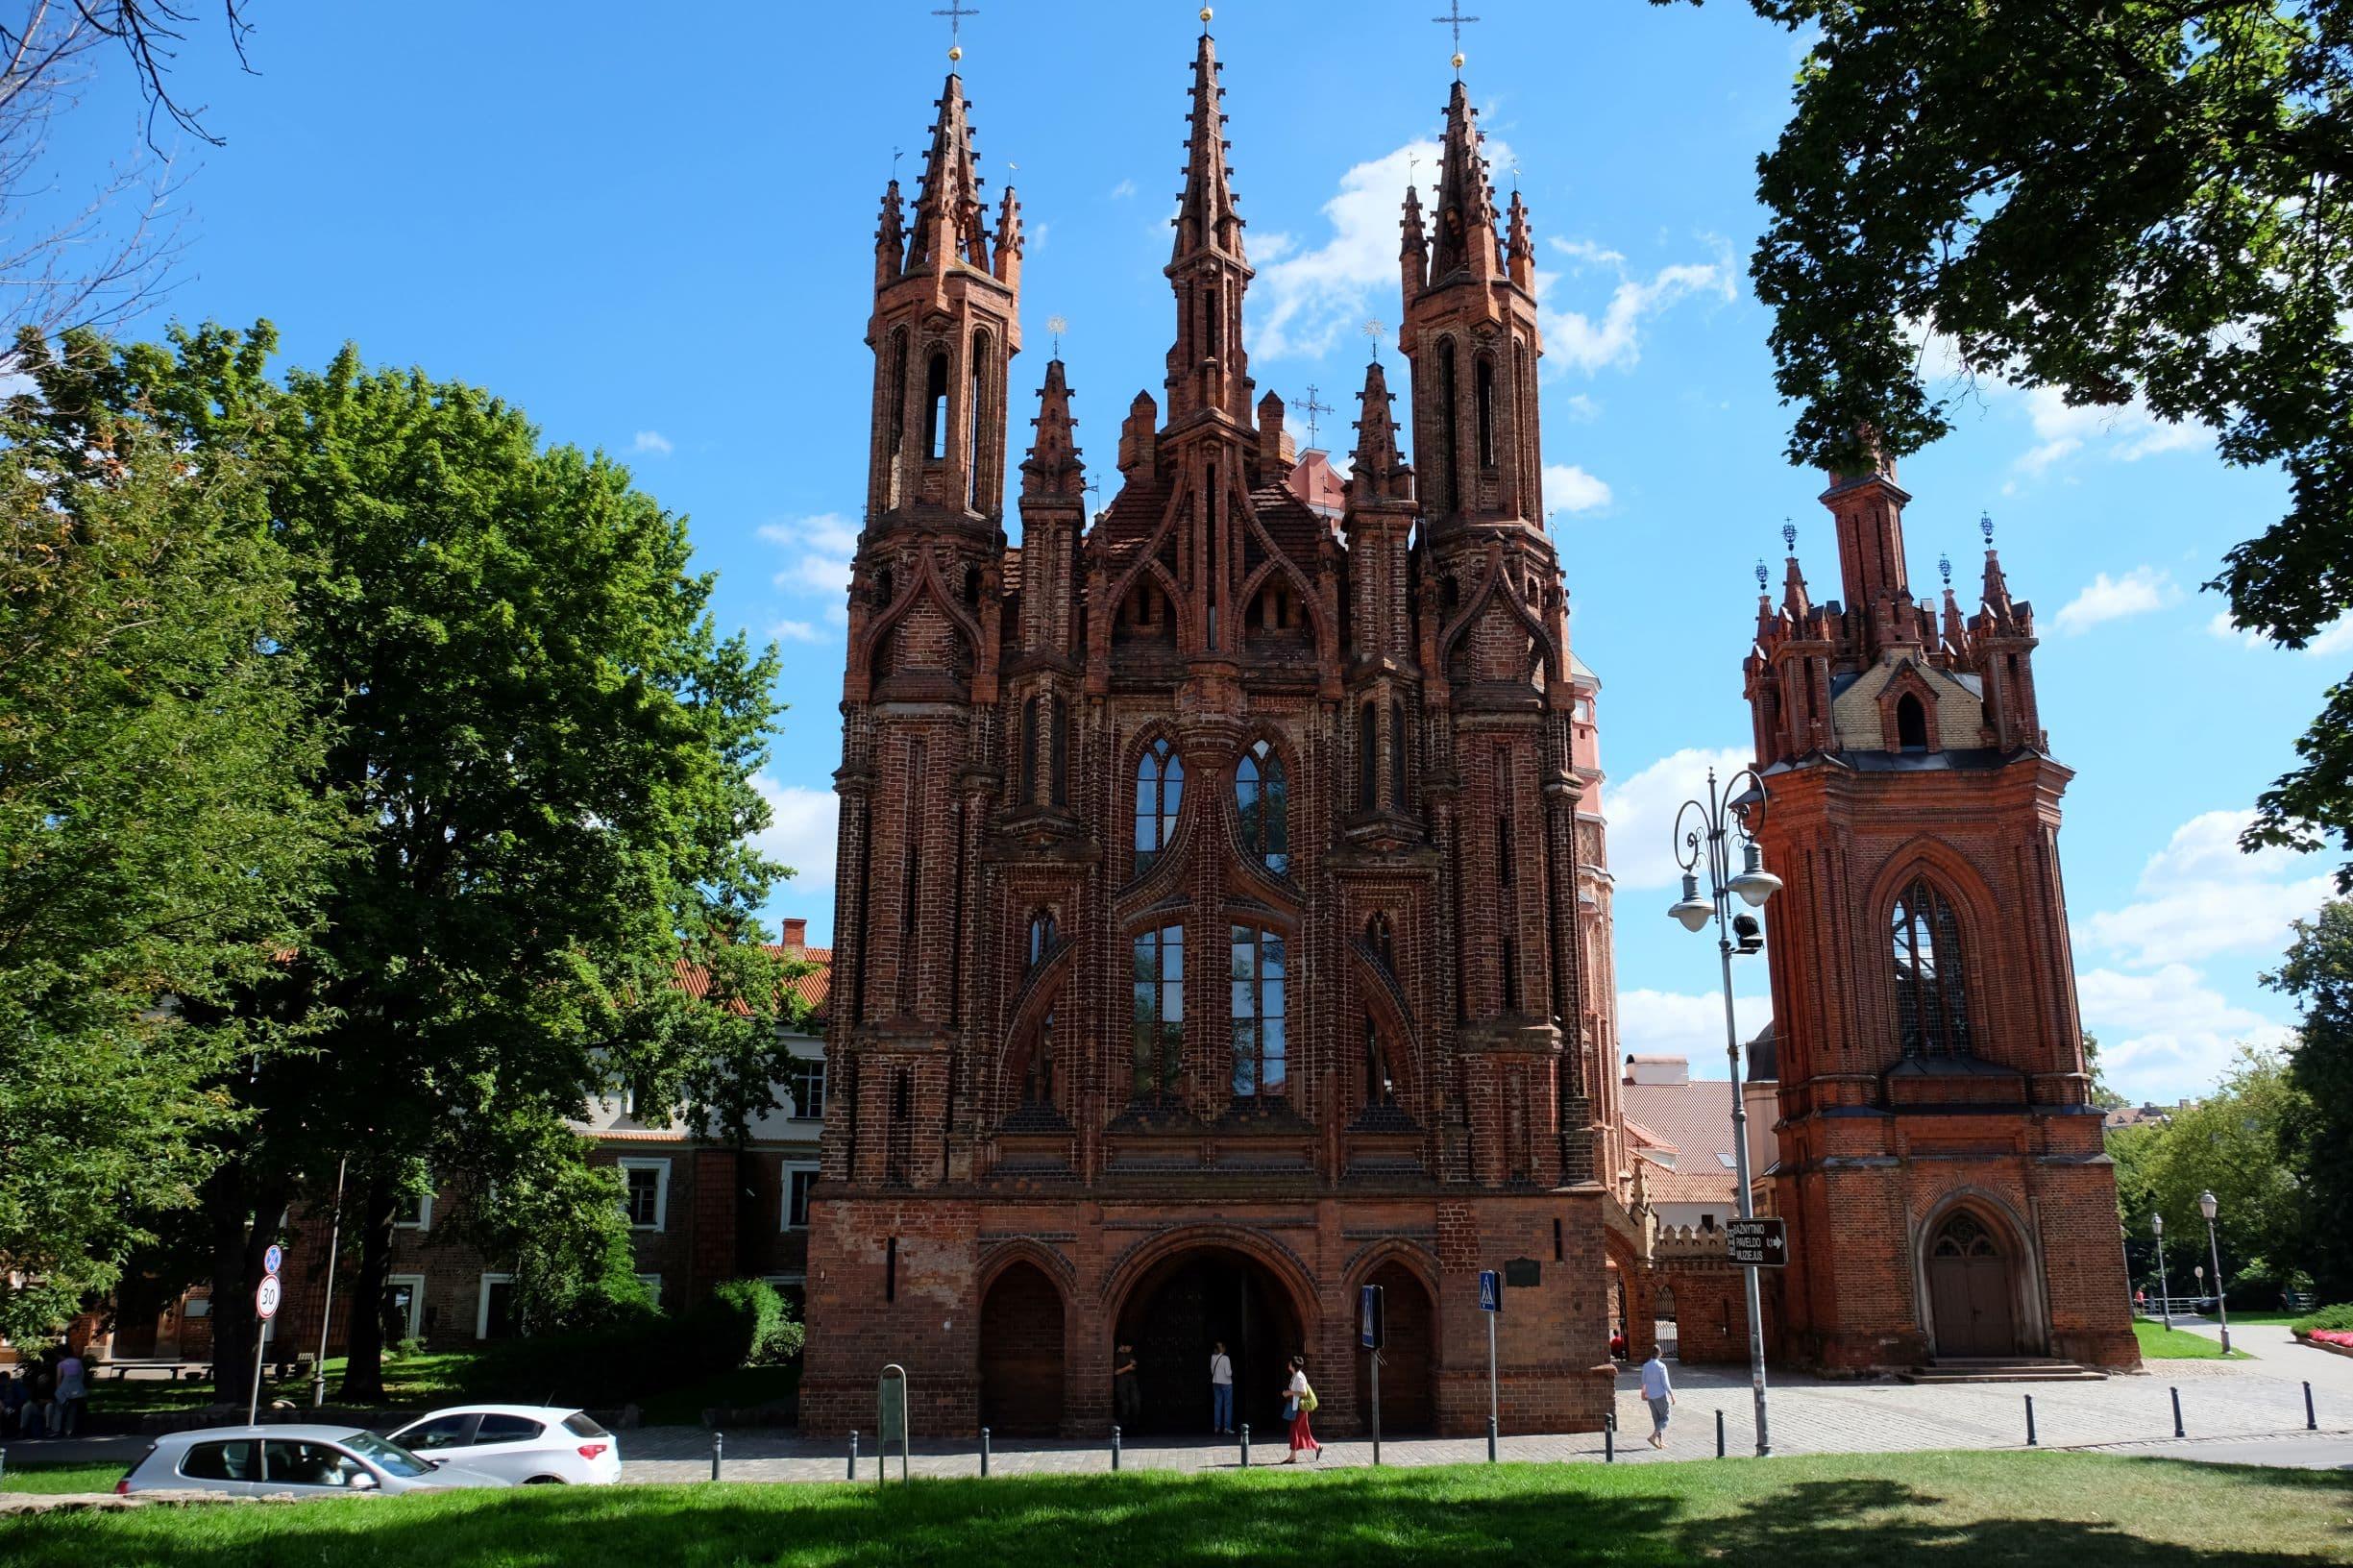 A legendary St Anne's church in Vilnius